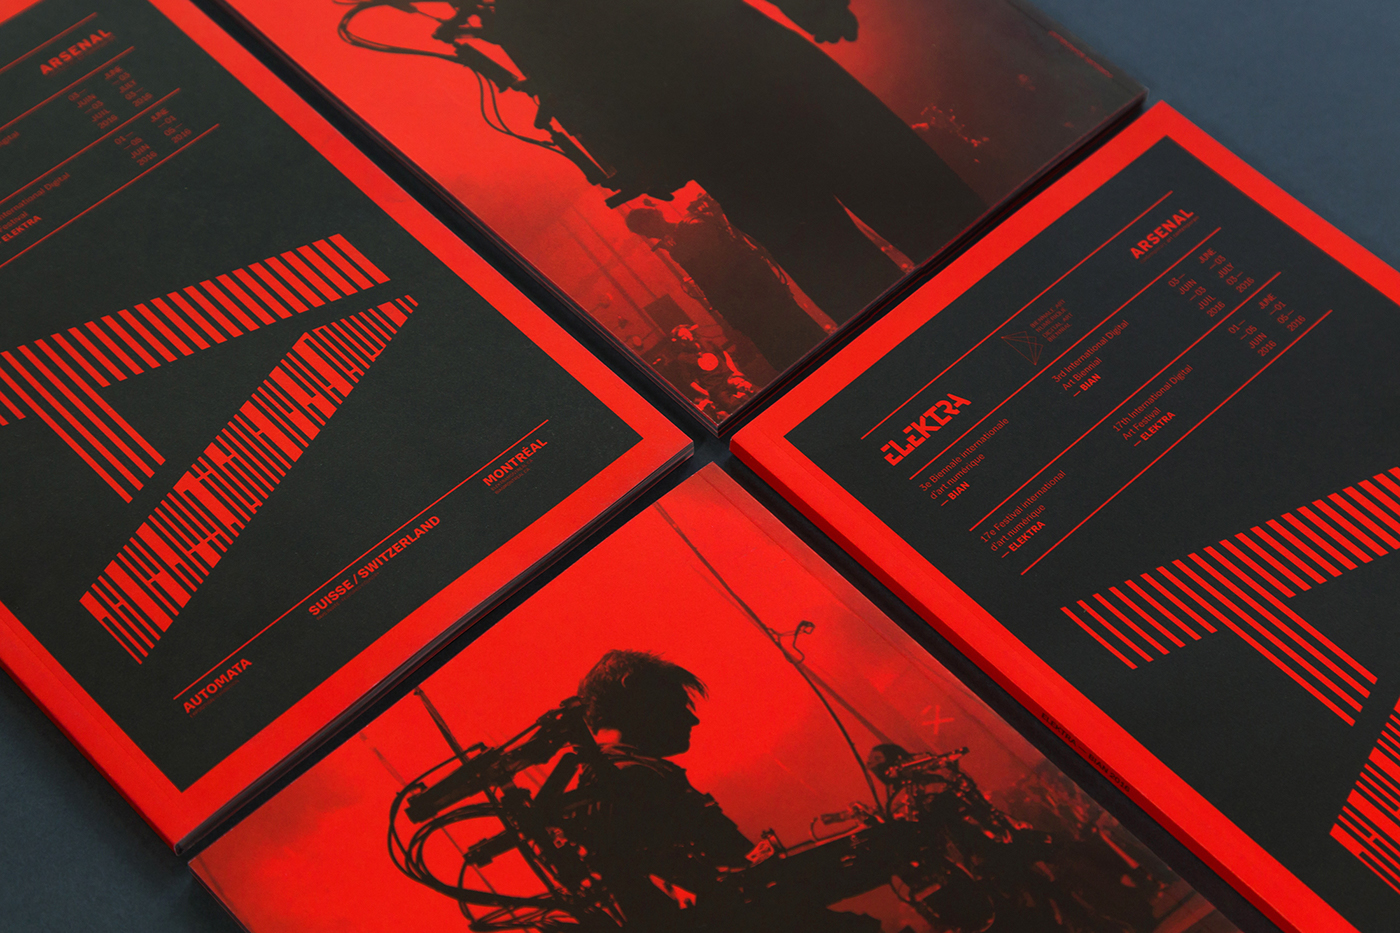 Baillat. Studio +  Louis Dollé - 3rd International Digital Art Biennial